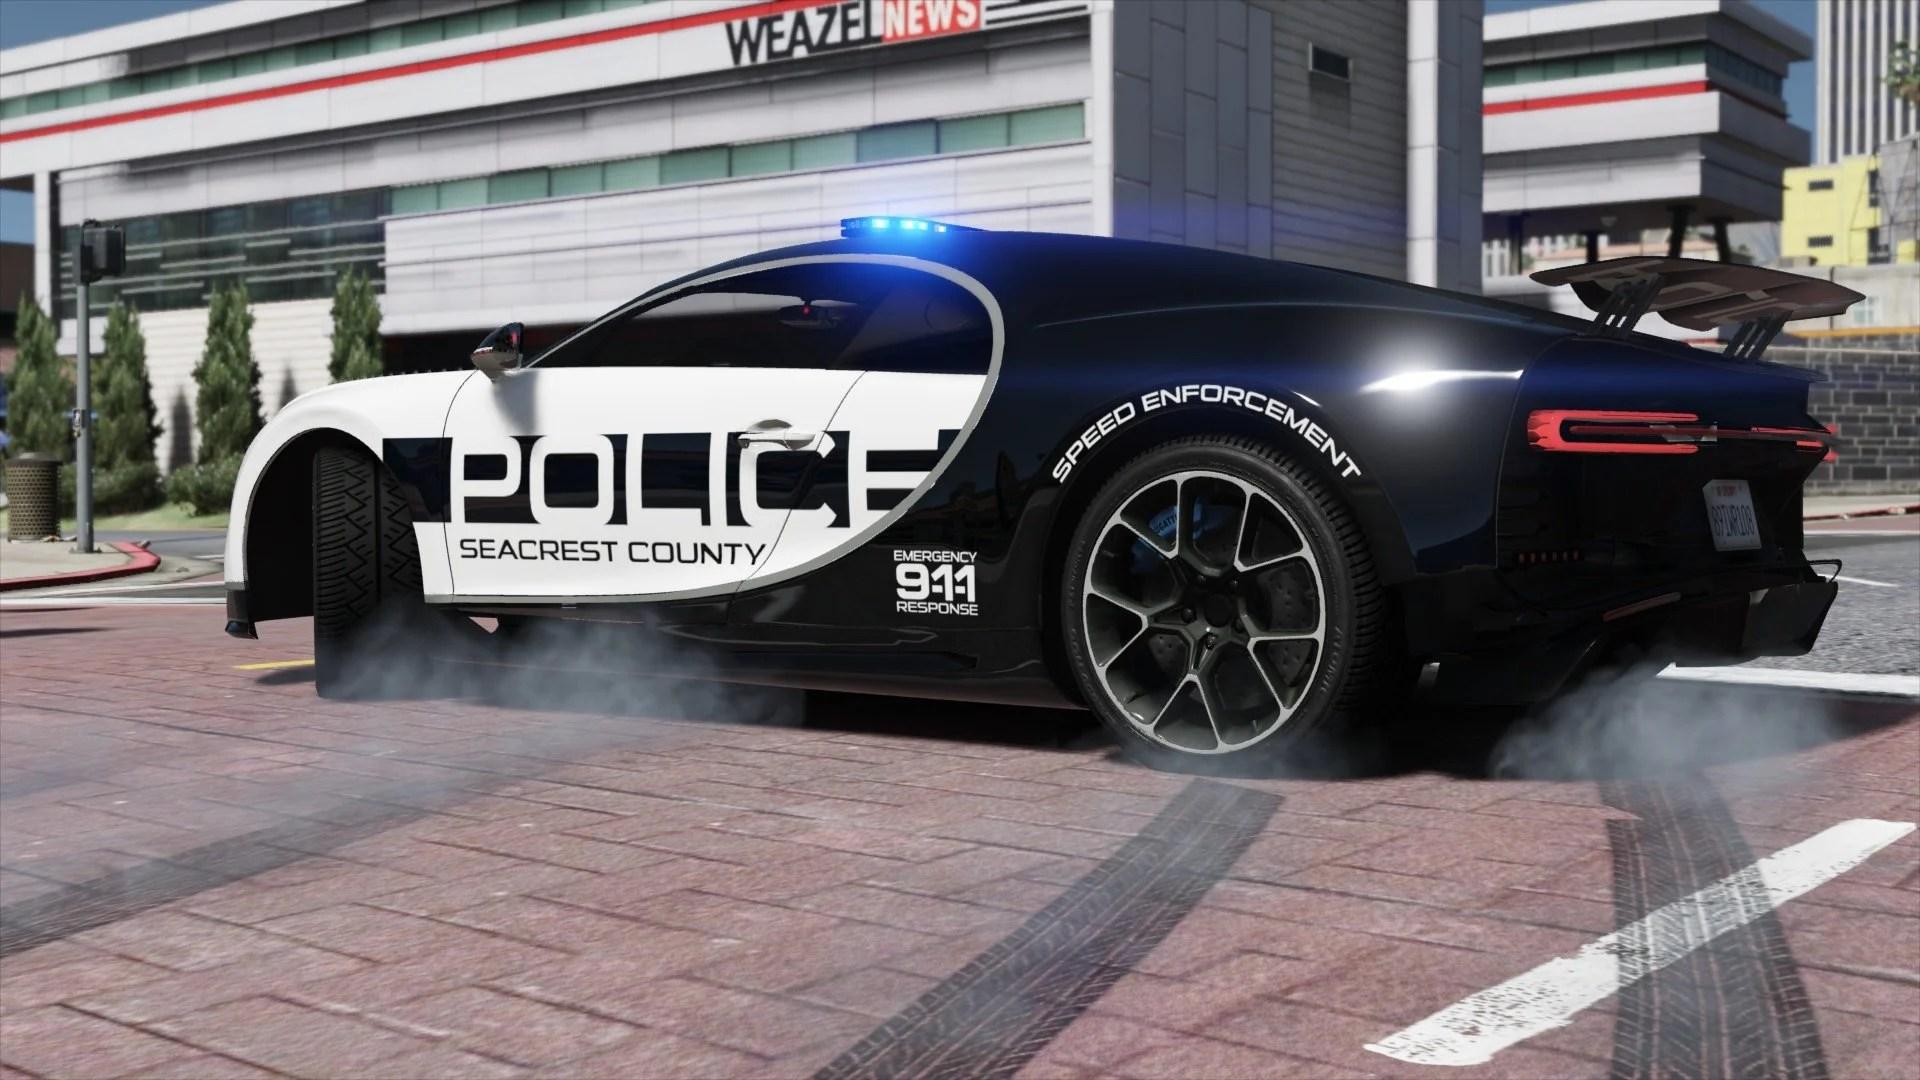 Gta 5 Cars Wallpaper Download Bugatti Chiron Hot Pursuit Police Add On Replace